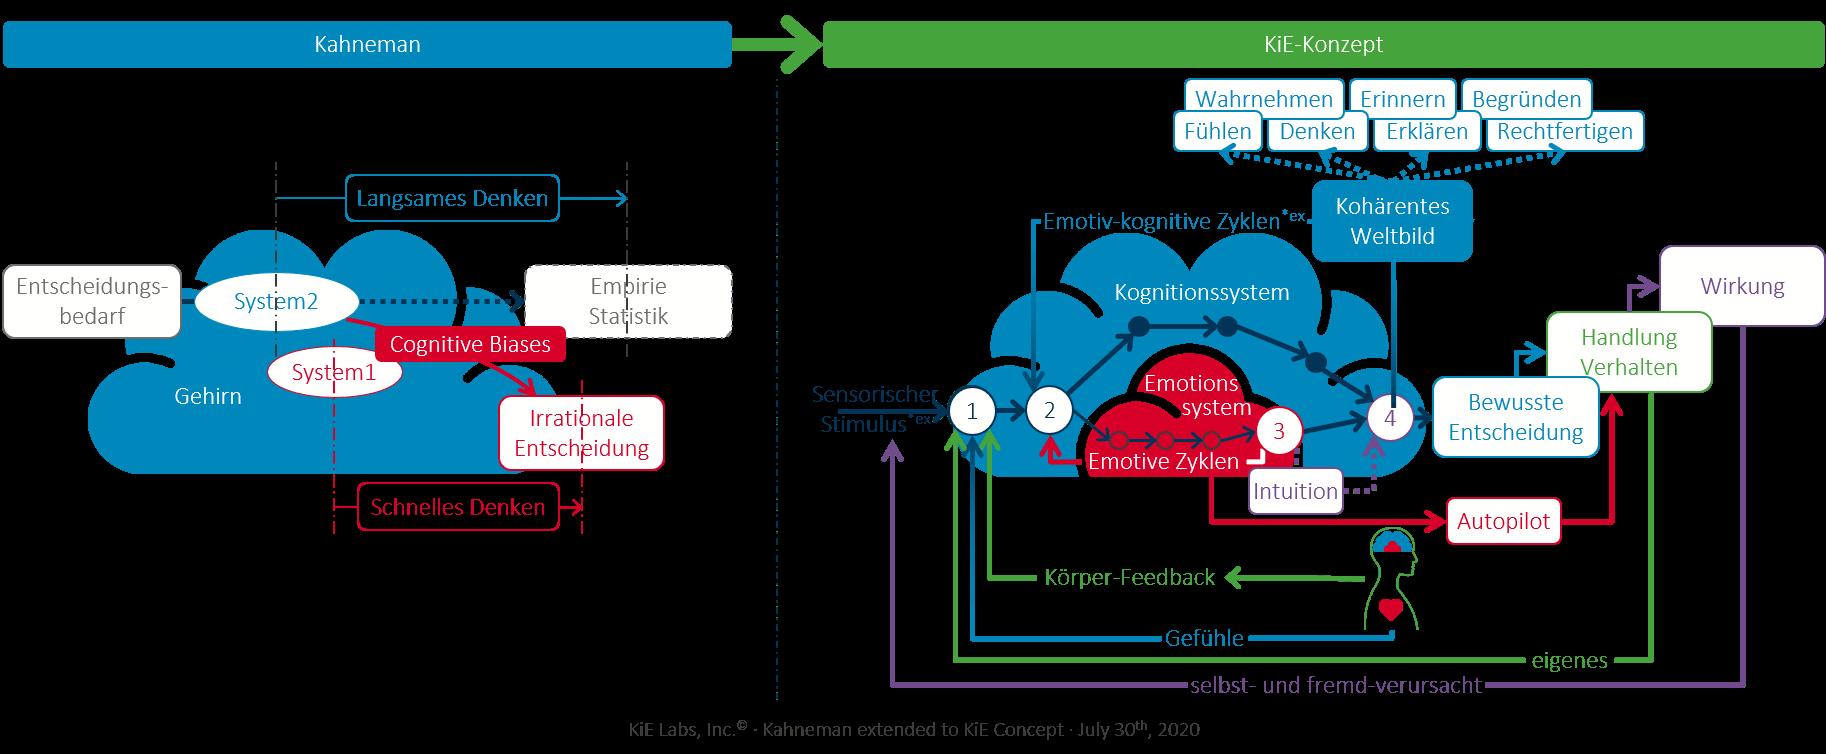 Das KiE-Konzept geht über Kahneman hinaus